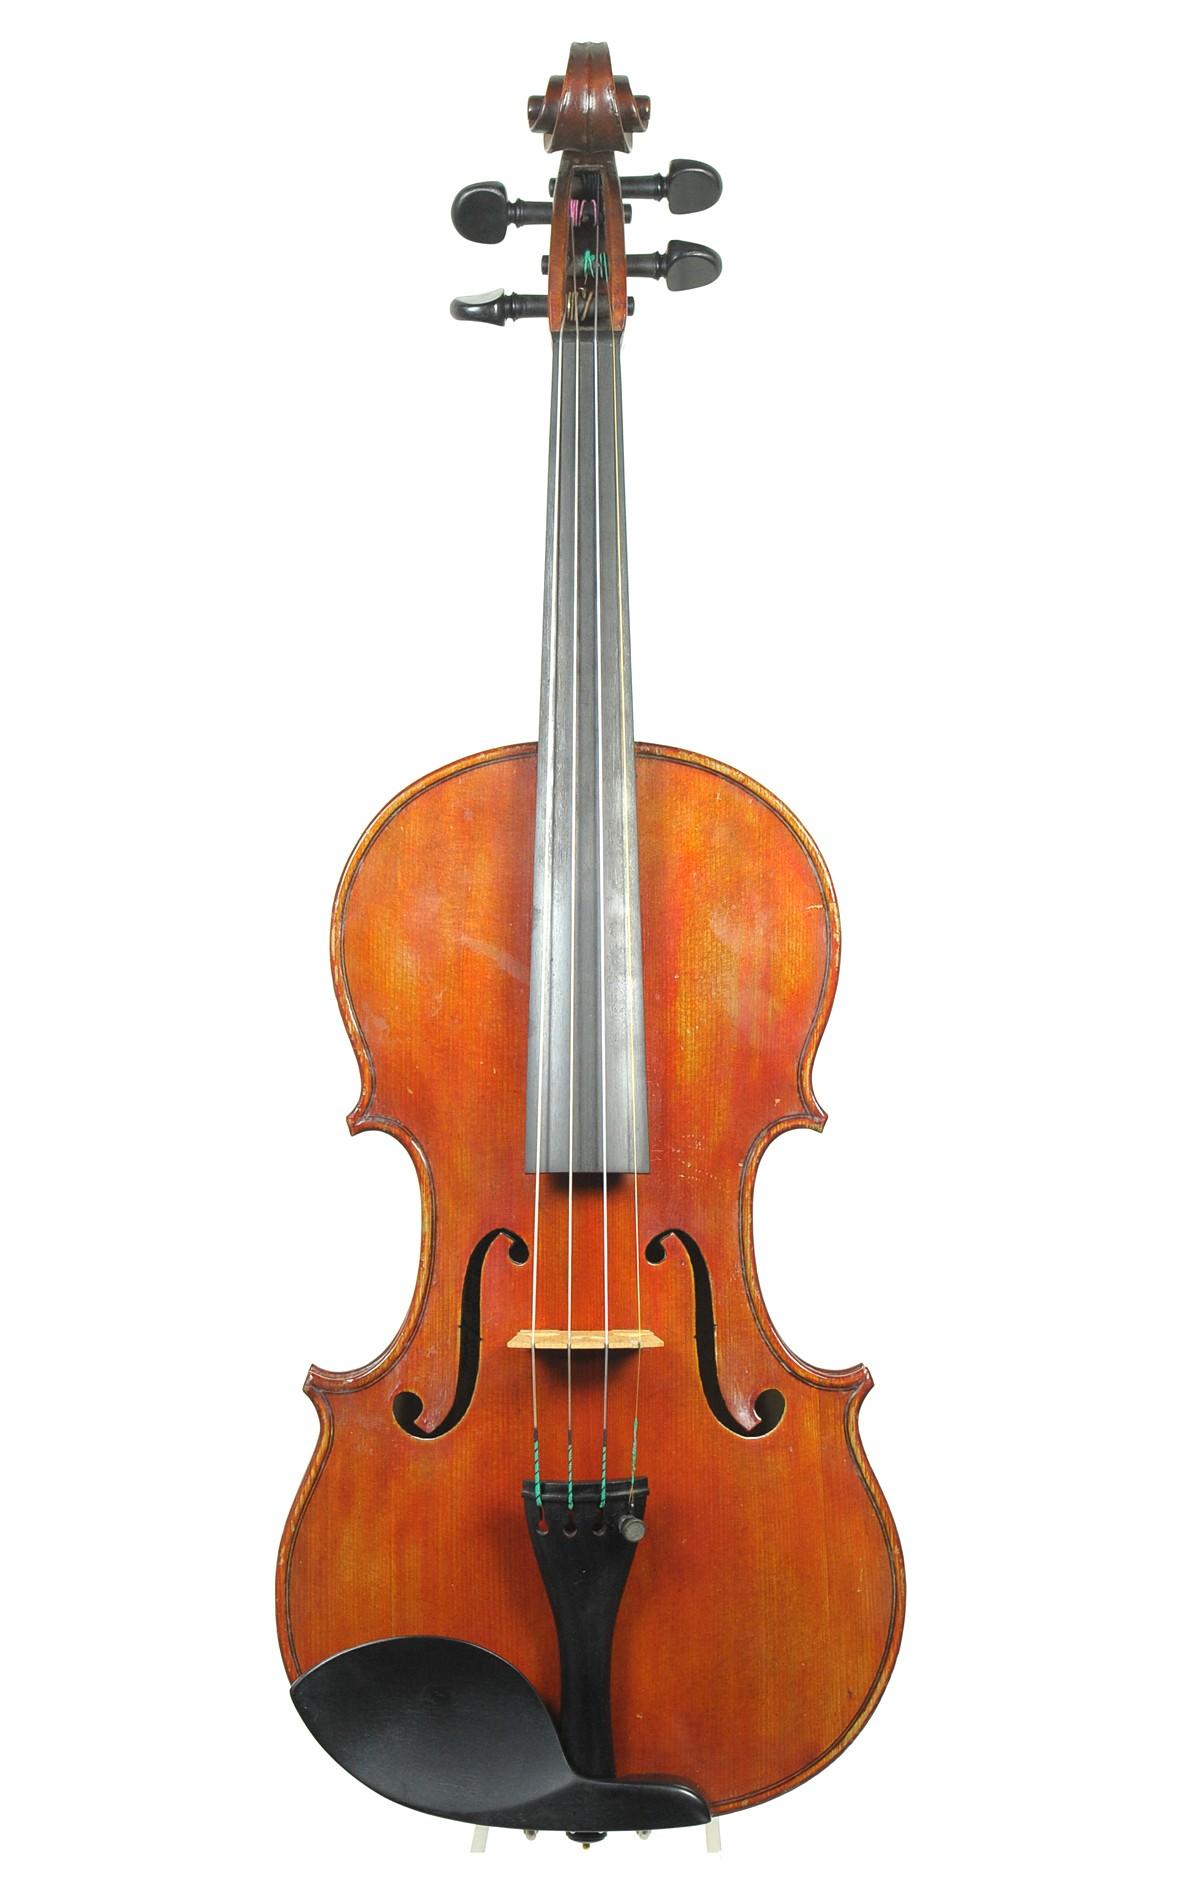 Italienische Geige von Franco Albanelli, Bologna